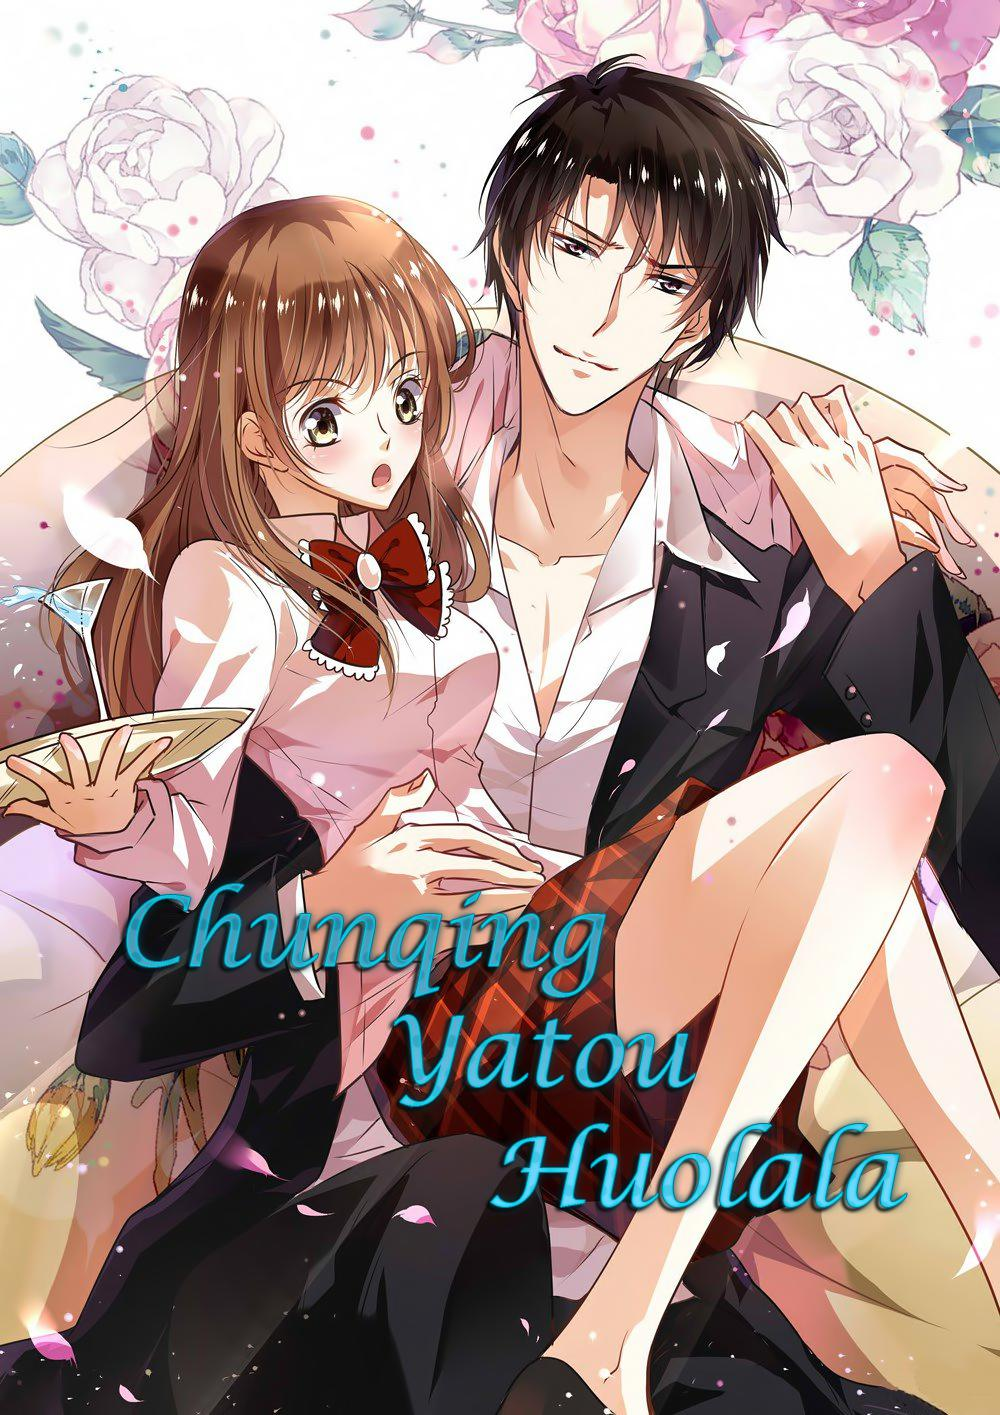 http://c5.ninemanga.com/es_manga/5/16069/385054/bd50a6d0a7efa023a5de5fa621ed3f74.jpg Page 1